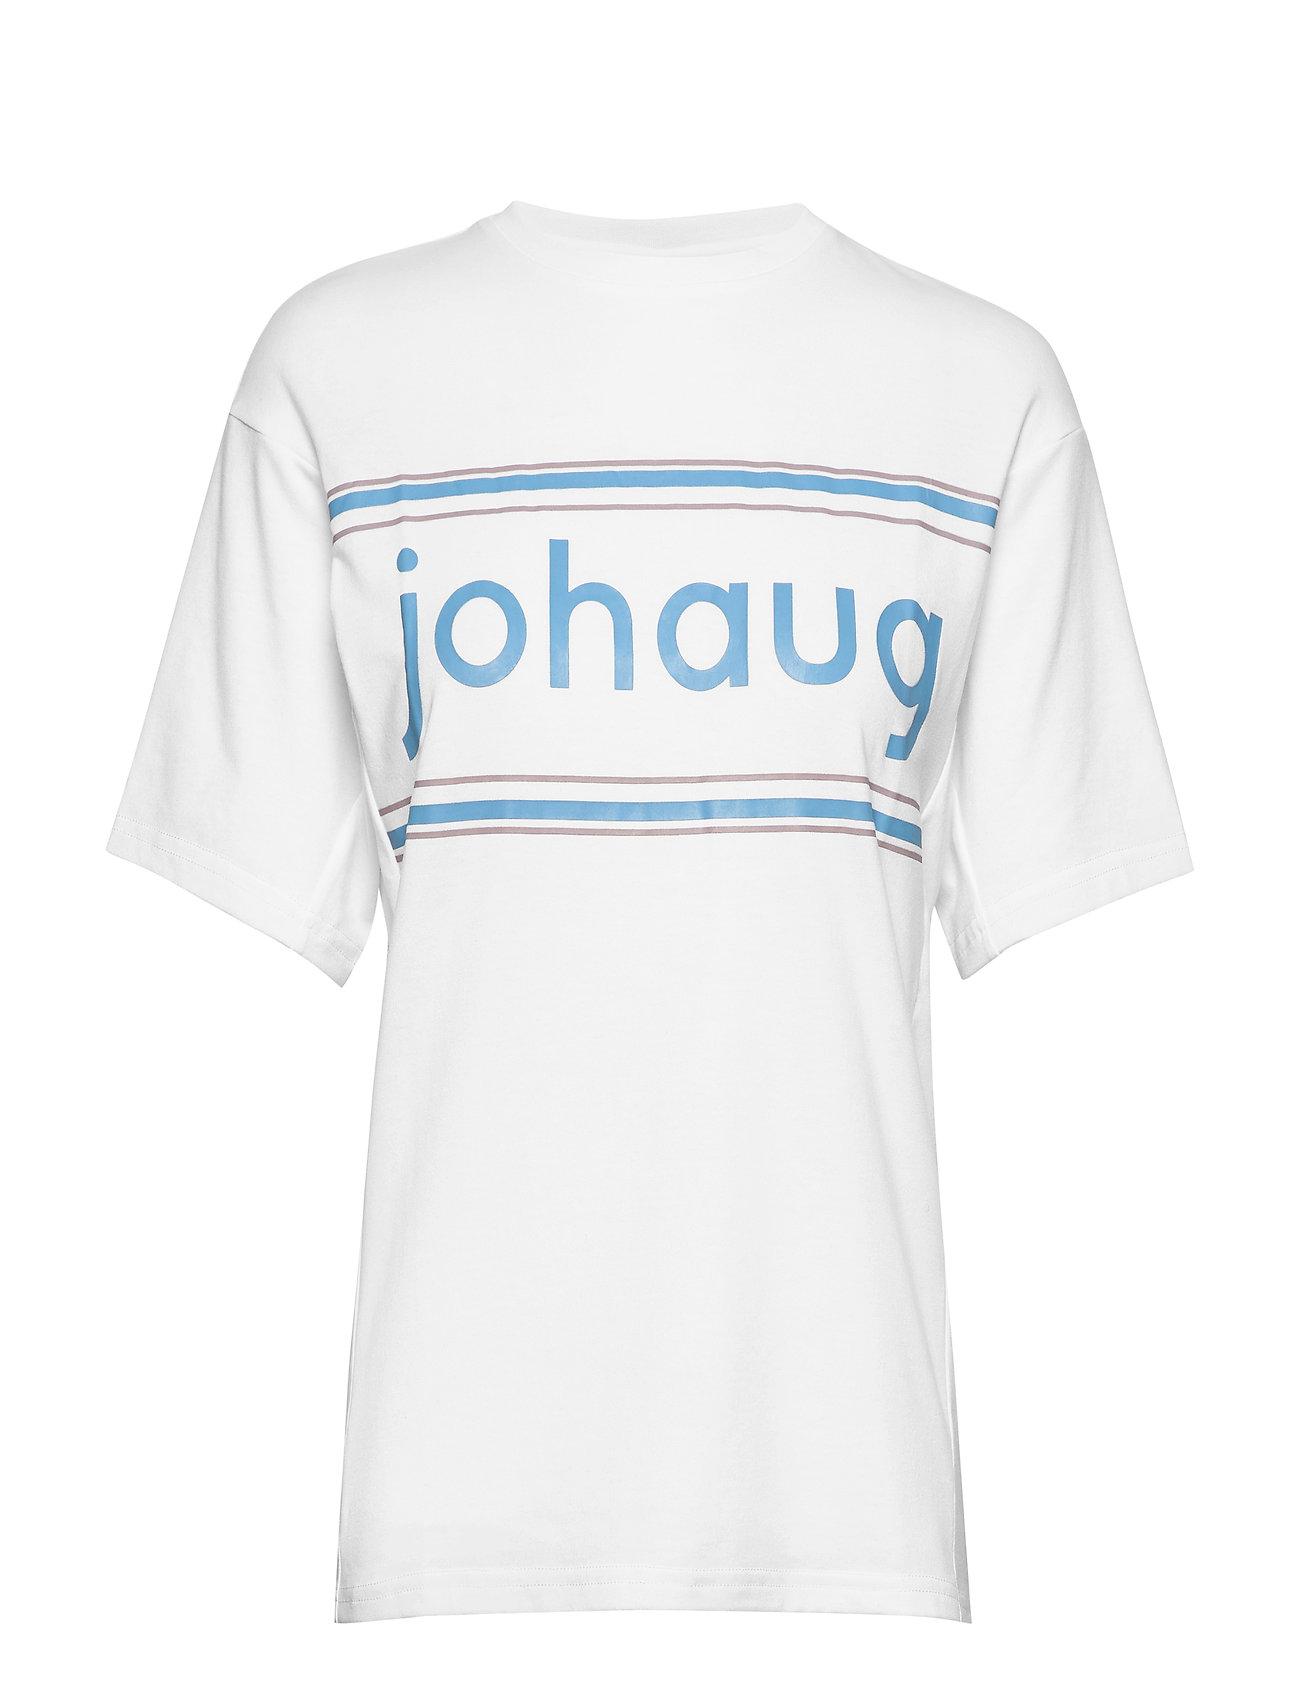 Johaug ACTIVE TEE 2.0 - WHITE